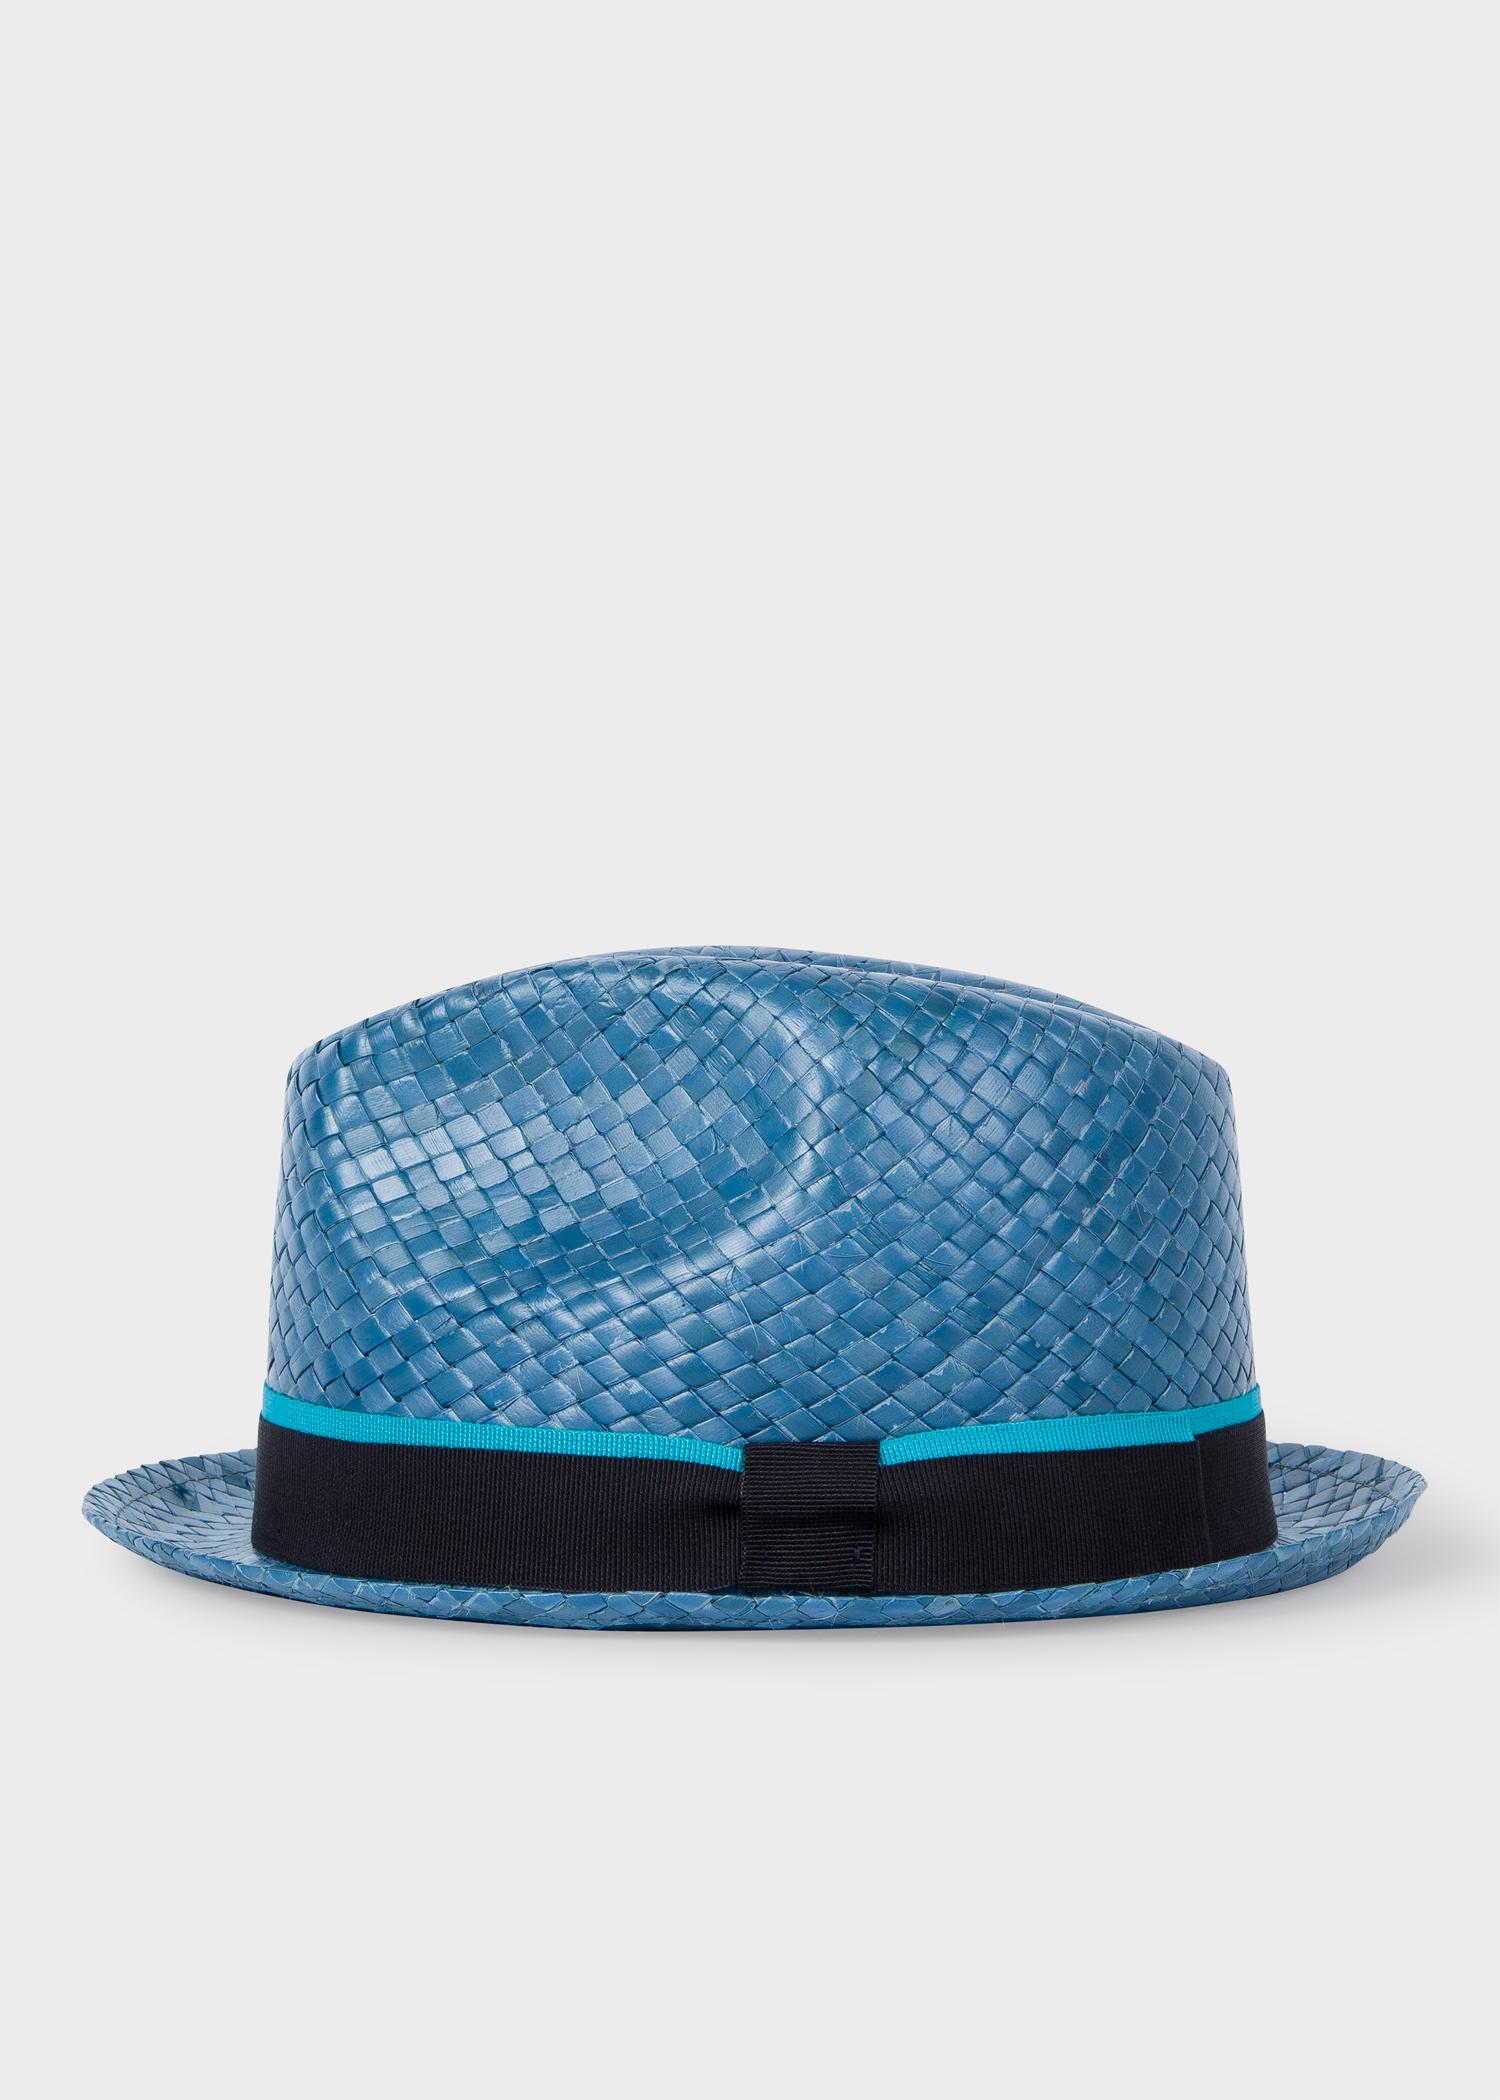 0864659f94ee9 Side view - Men s Slate Blue Woven Trilby Hat Paul Smith